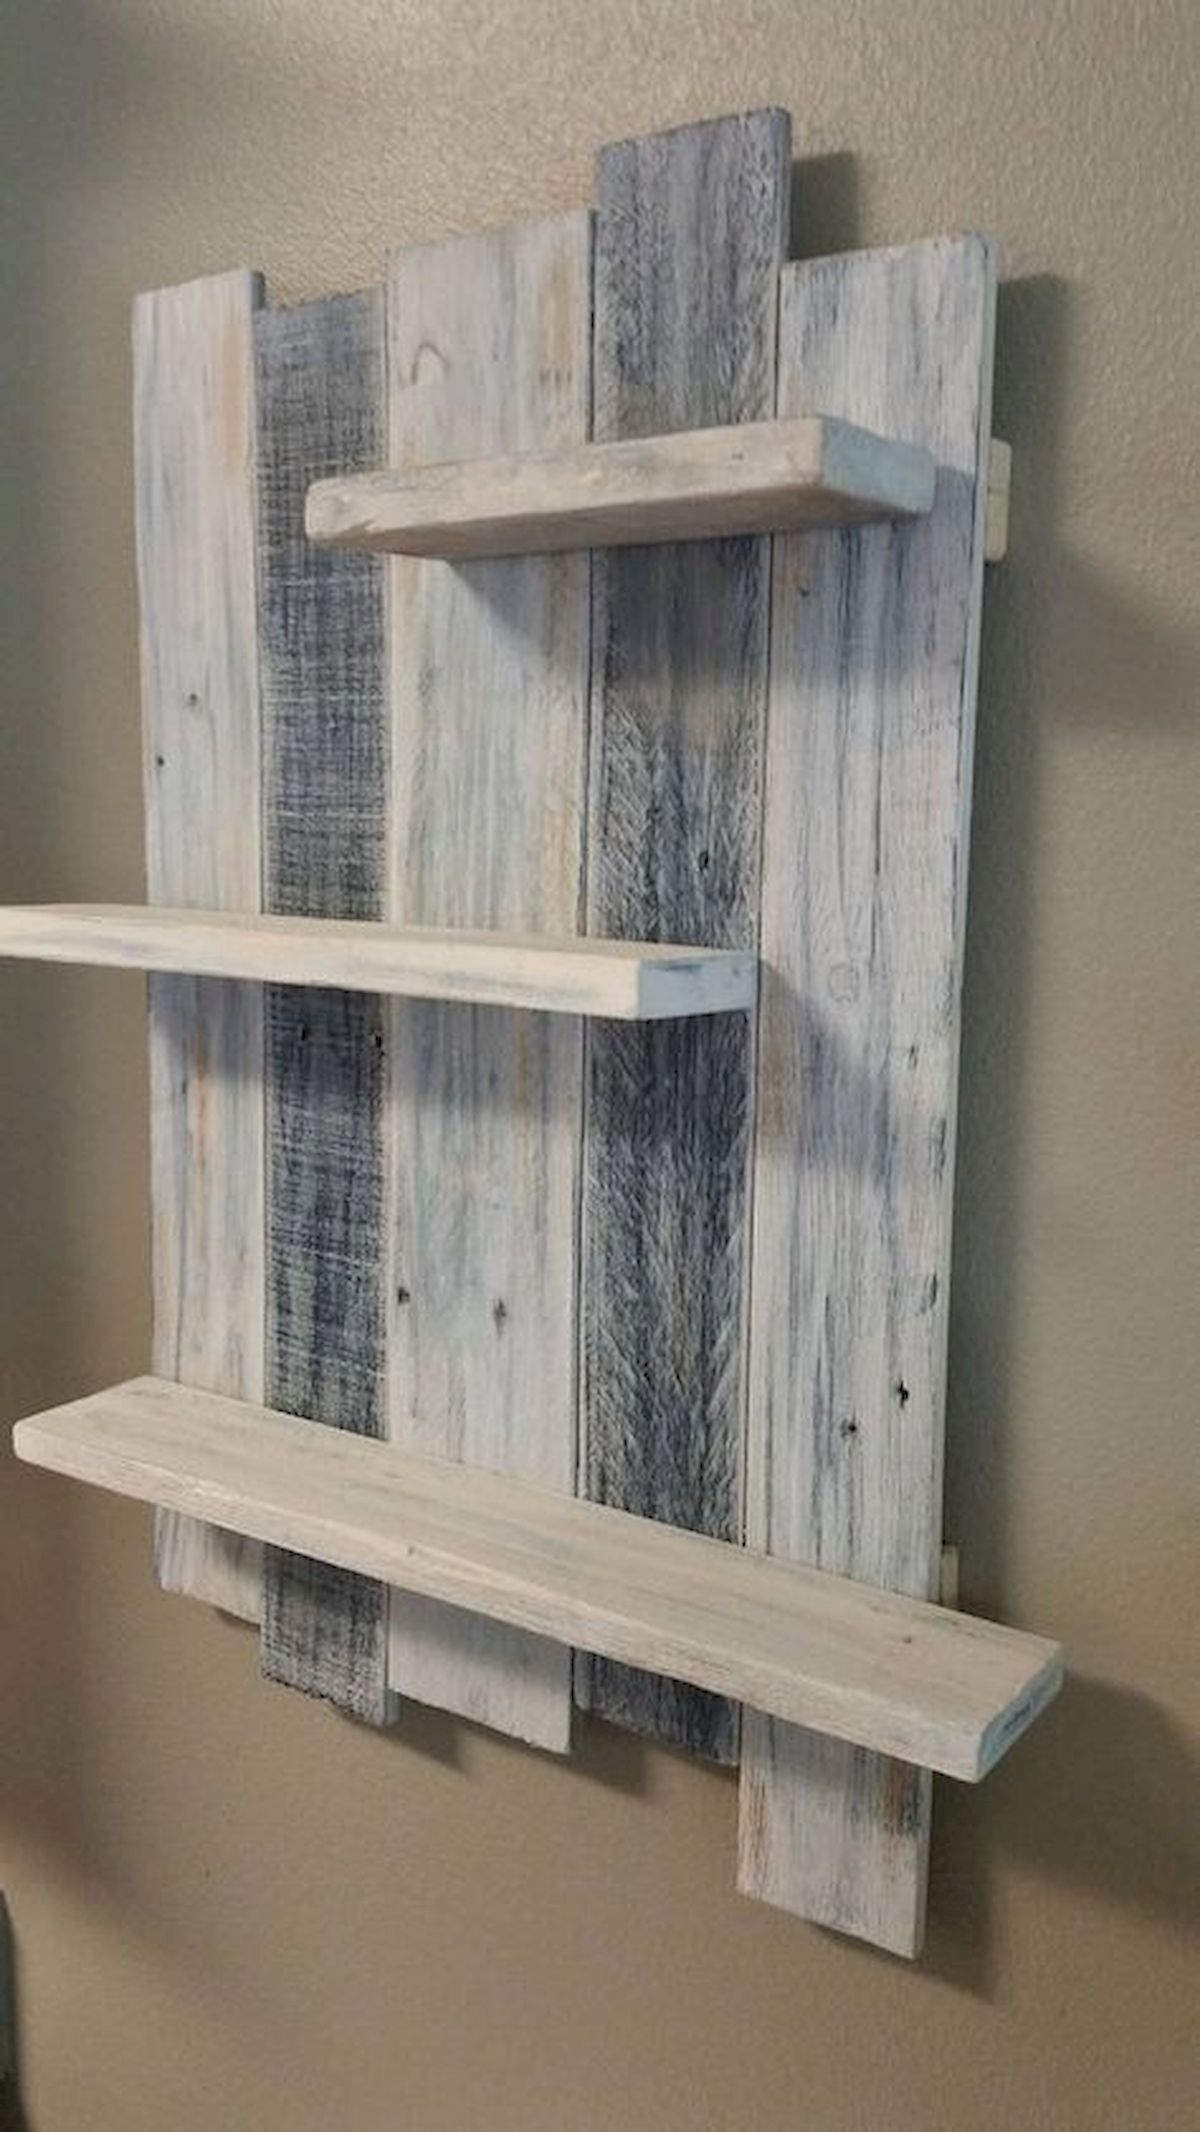 50 Amazing DIY Bookshelf Design Ideas for Your Home in 2020